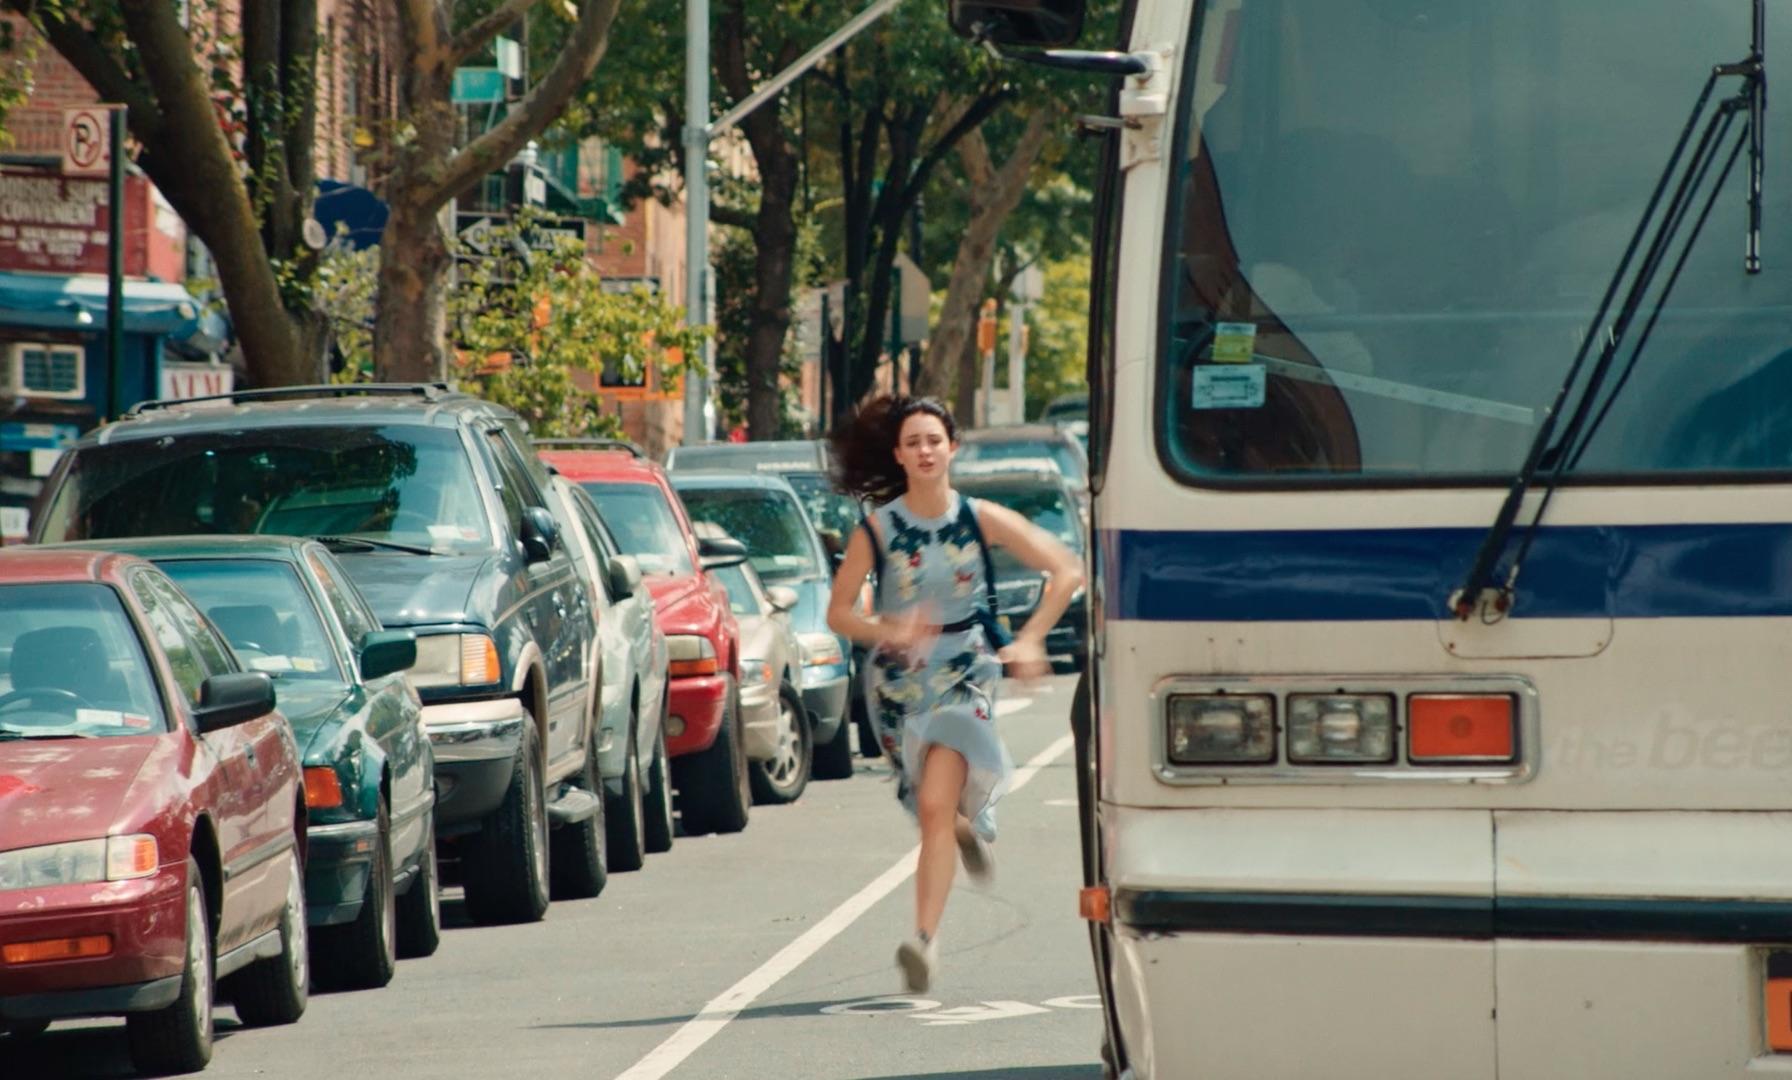 ELLIE RUNNING 5854.jpg